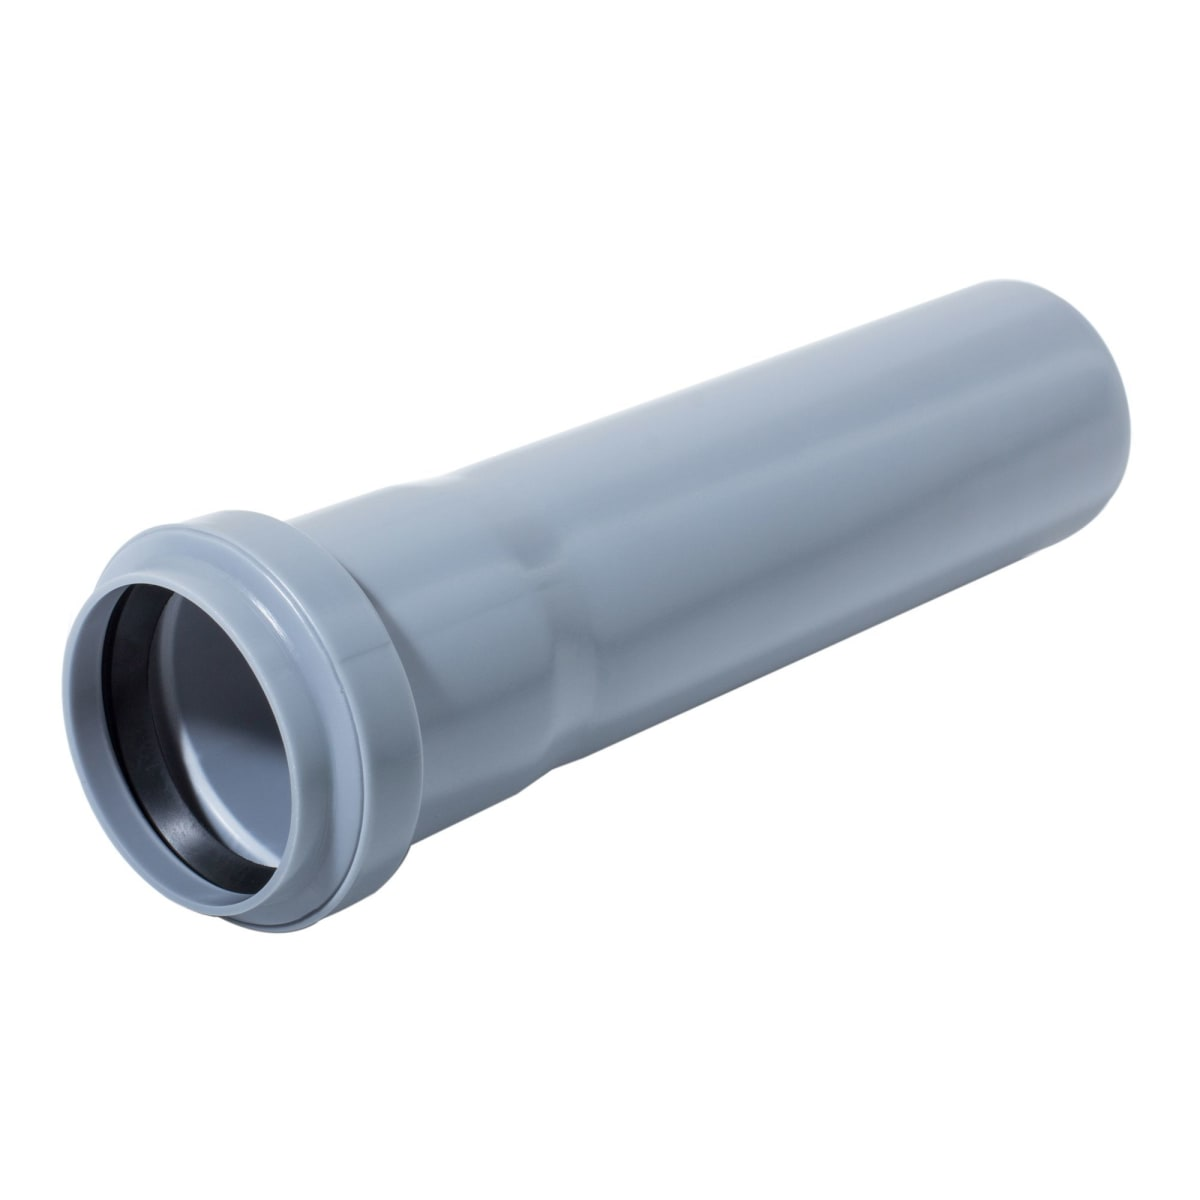 Труба канализационная Ø 32 мм L 0.15м полипропилен